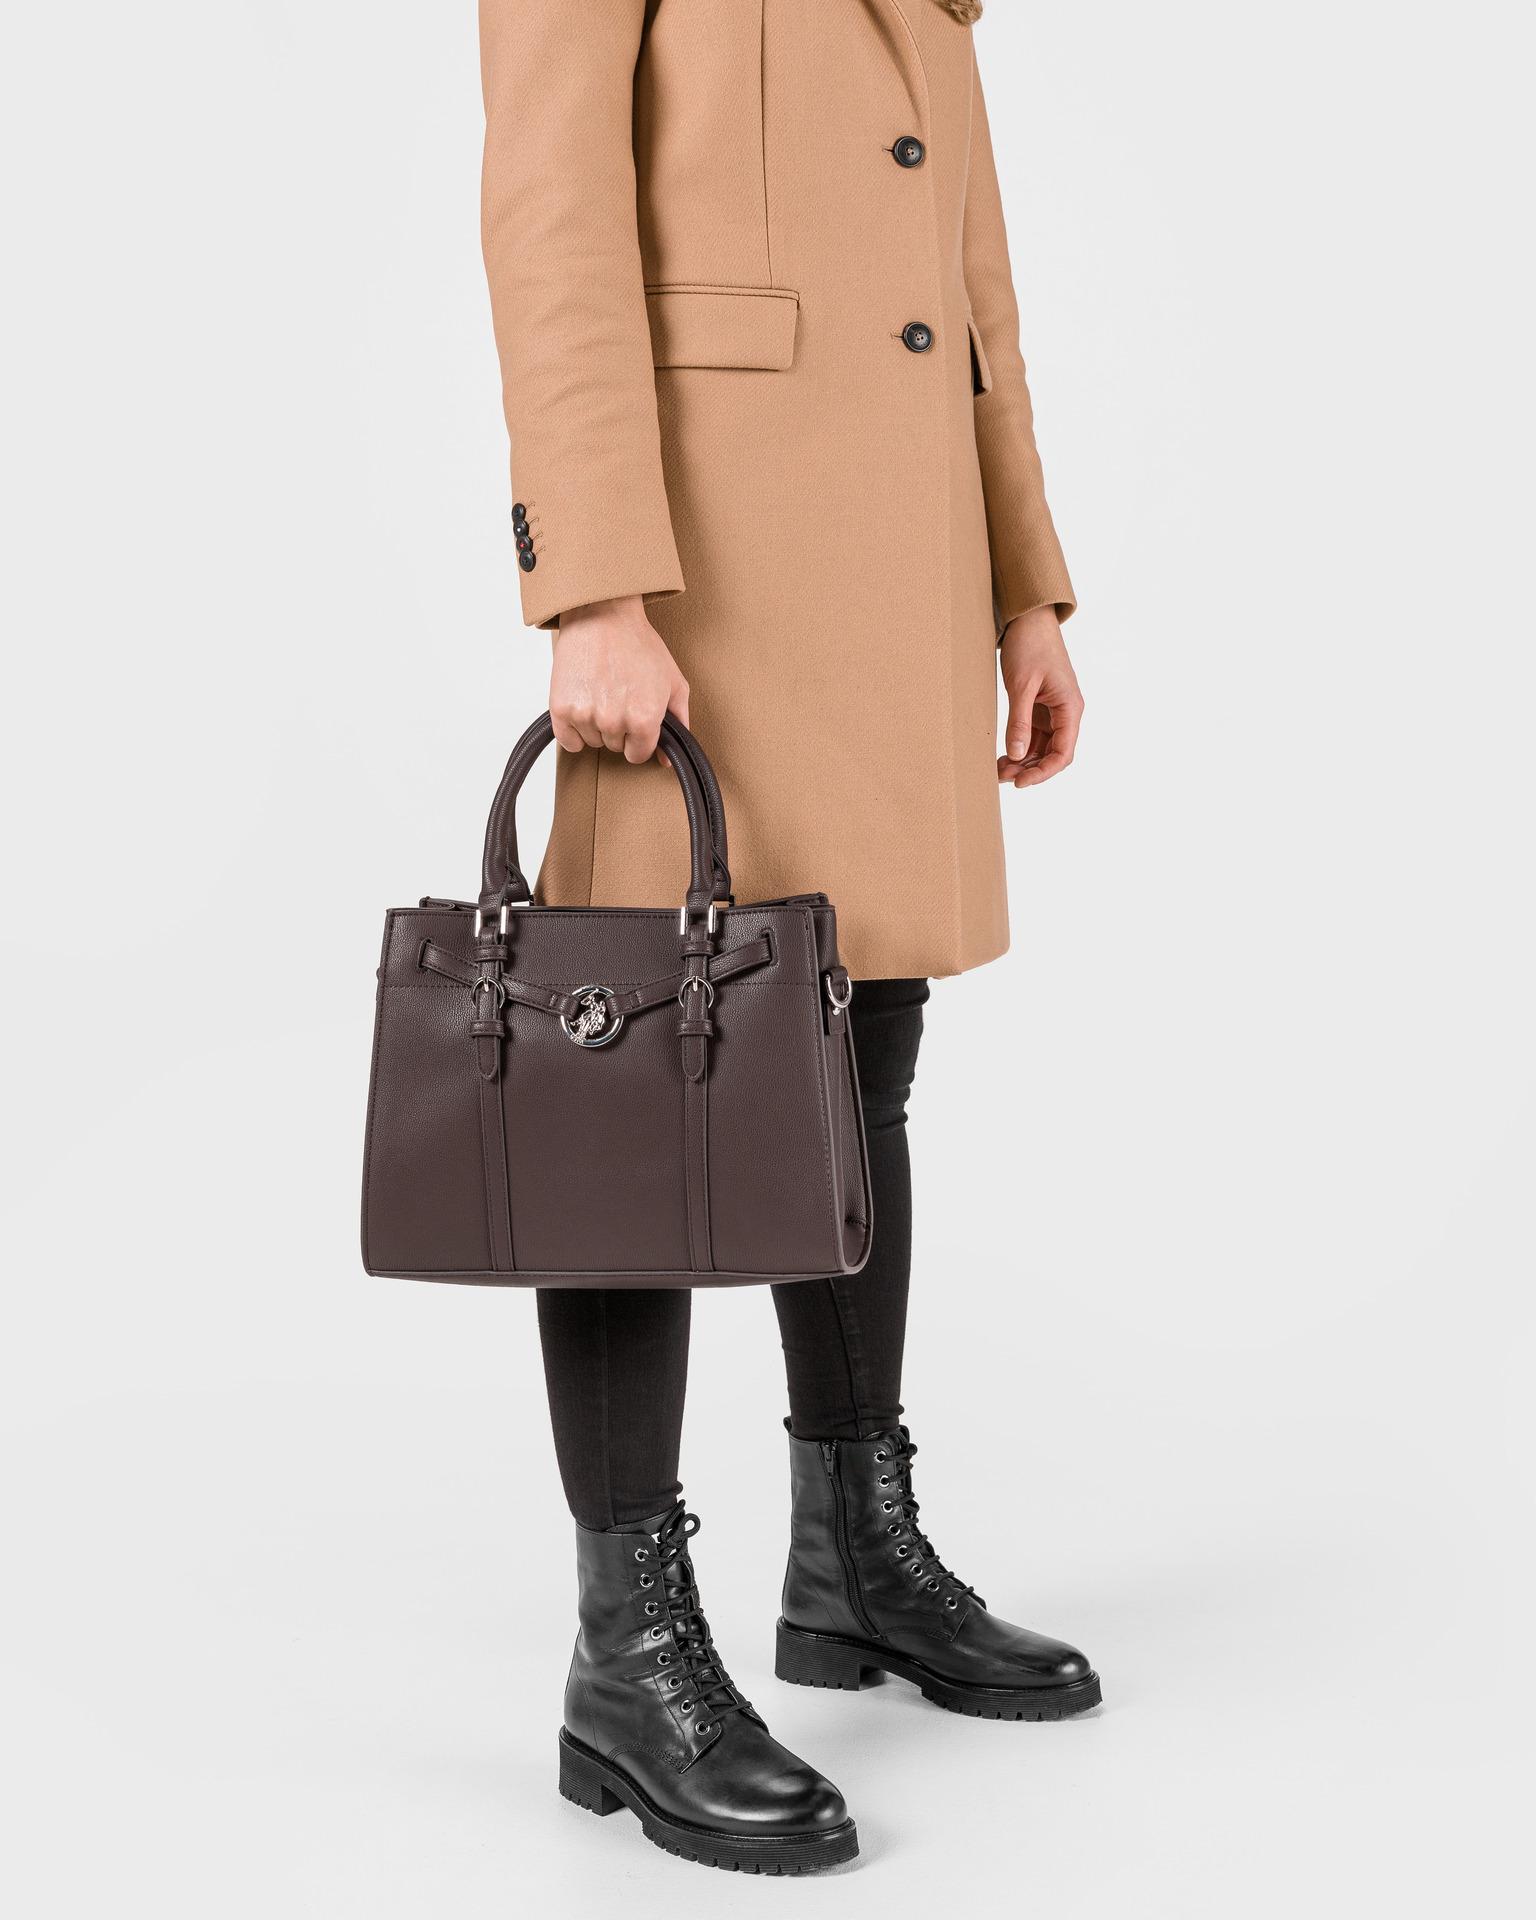 U.S. Polo Assn. Borsetta donna marrone  Kabelka